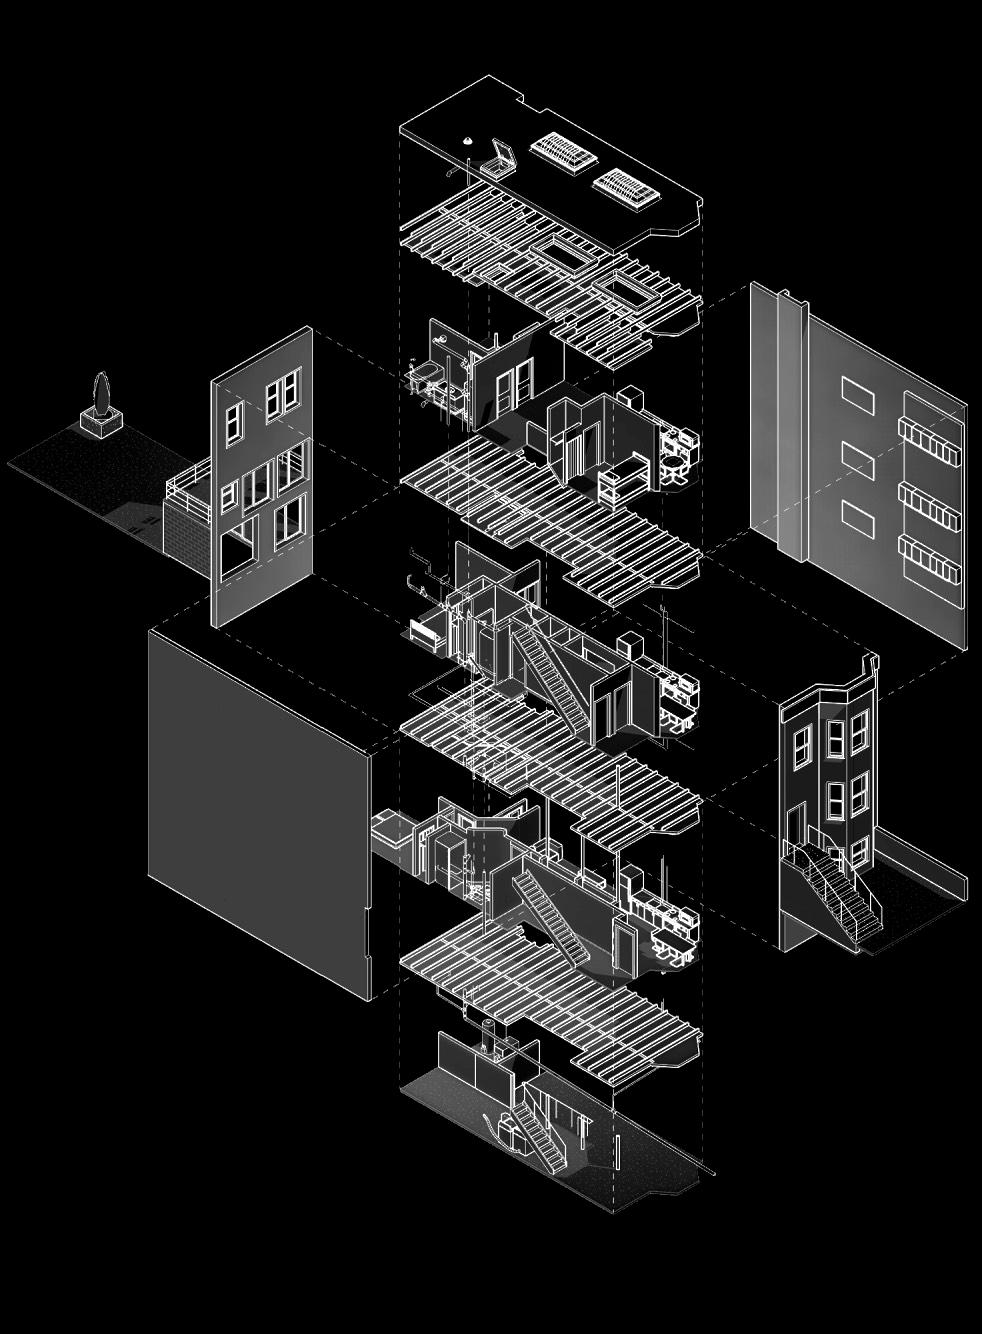 IP BIM - Inverted.jpg